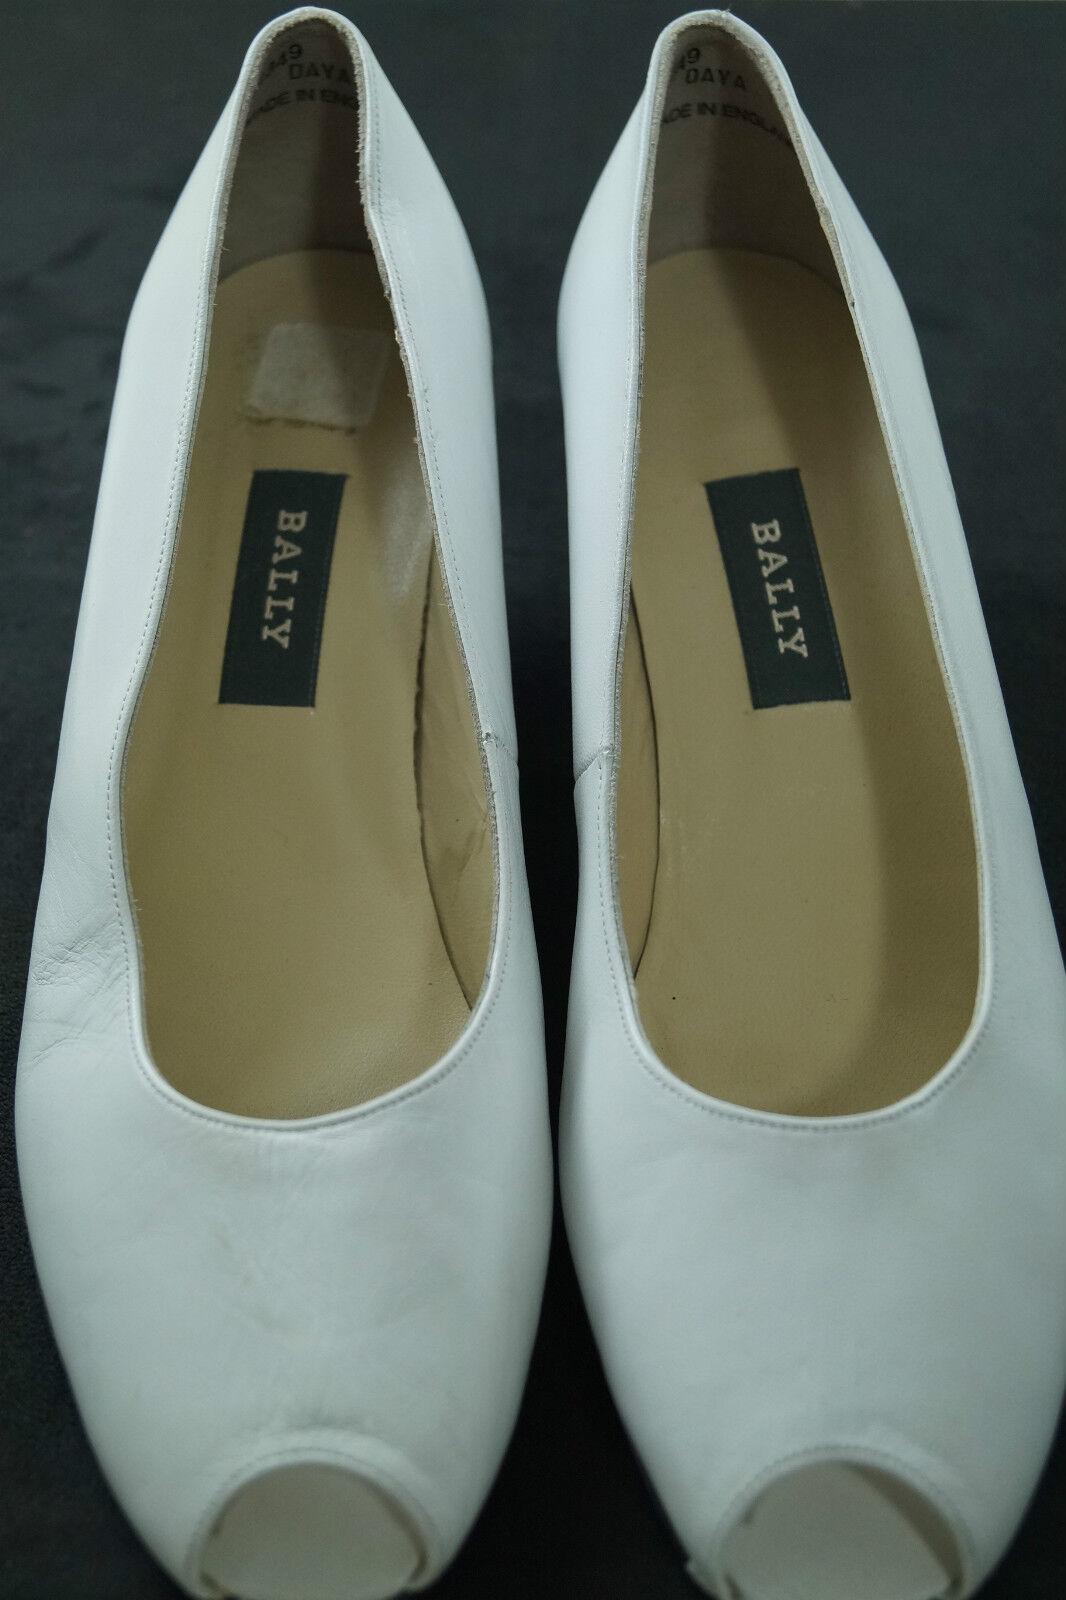 BALLY Switzerland  Daya  Peep Toe Court chaussures blanc Pumps Wedding Prom Taille 7C